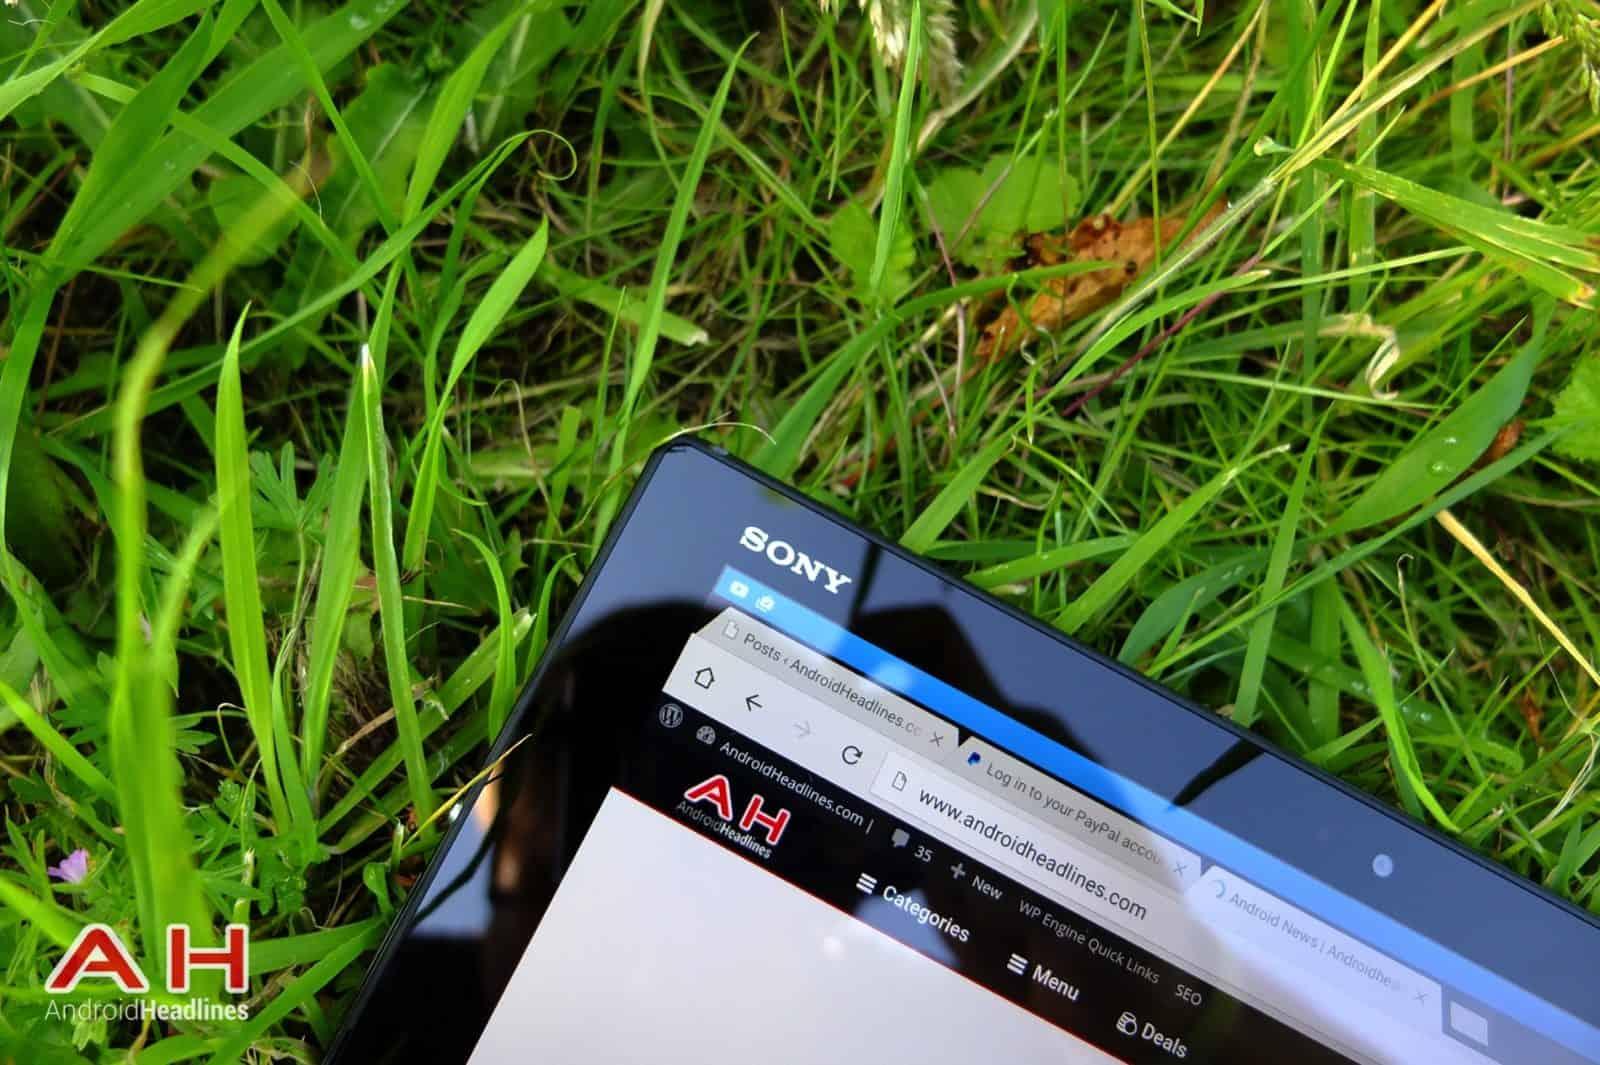 Xperia Z4 Tablet AH 05